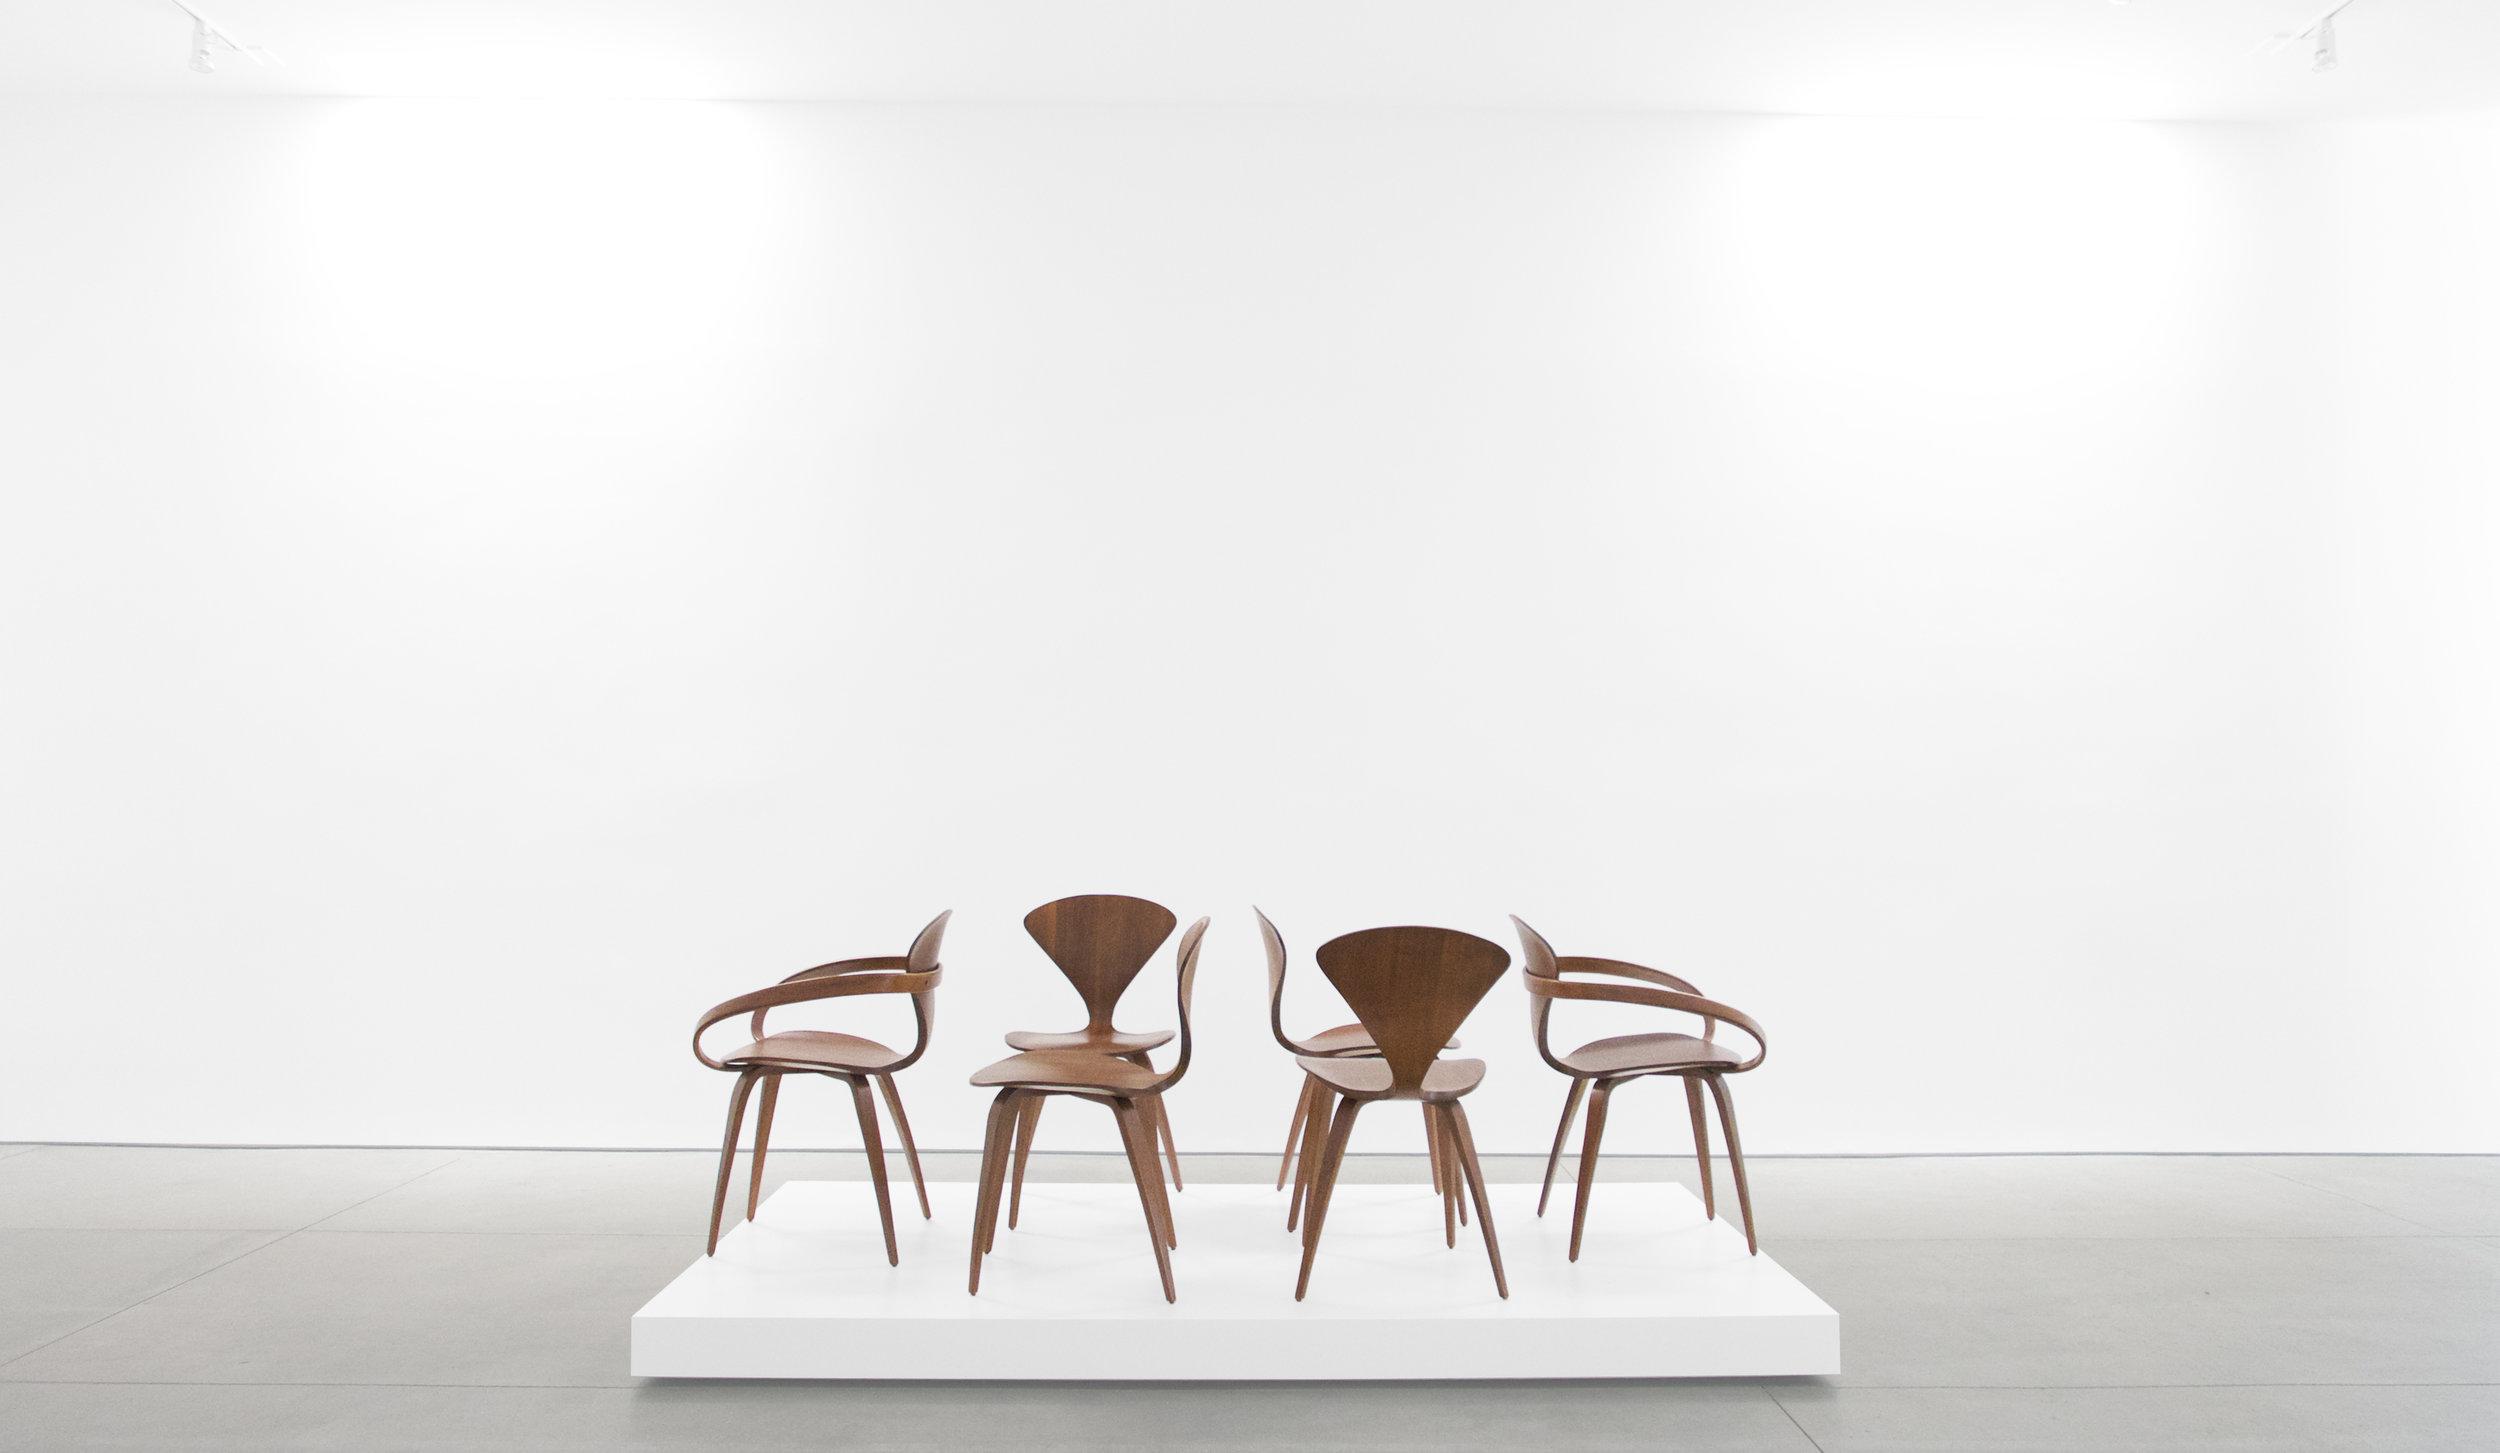 1. Norman Cherner, Pretzel Chairs, c. 1958, walnut, (4) 31H x 17W x 18.5 inches (2) 31H x 26W x 19D inches.jpg